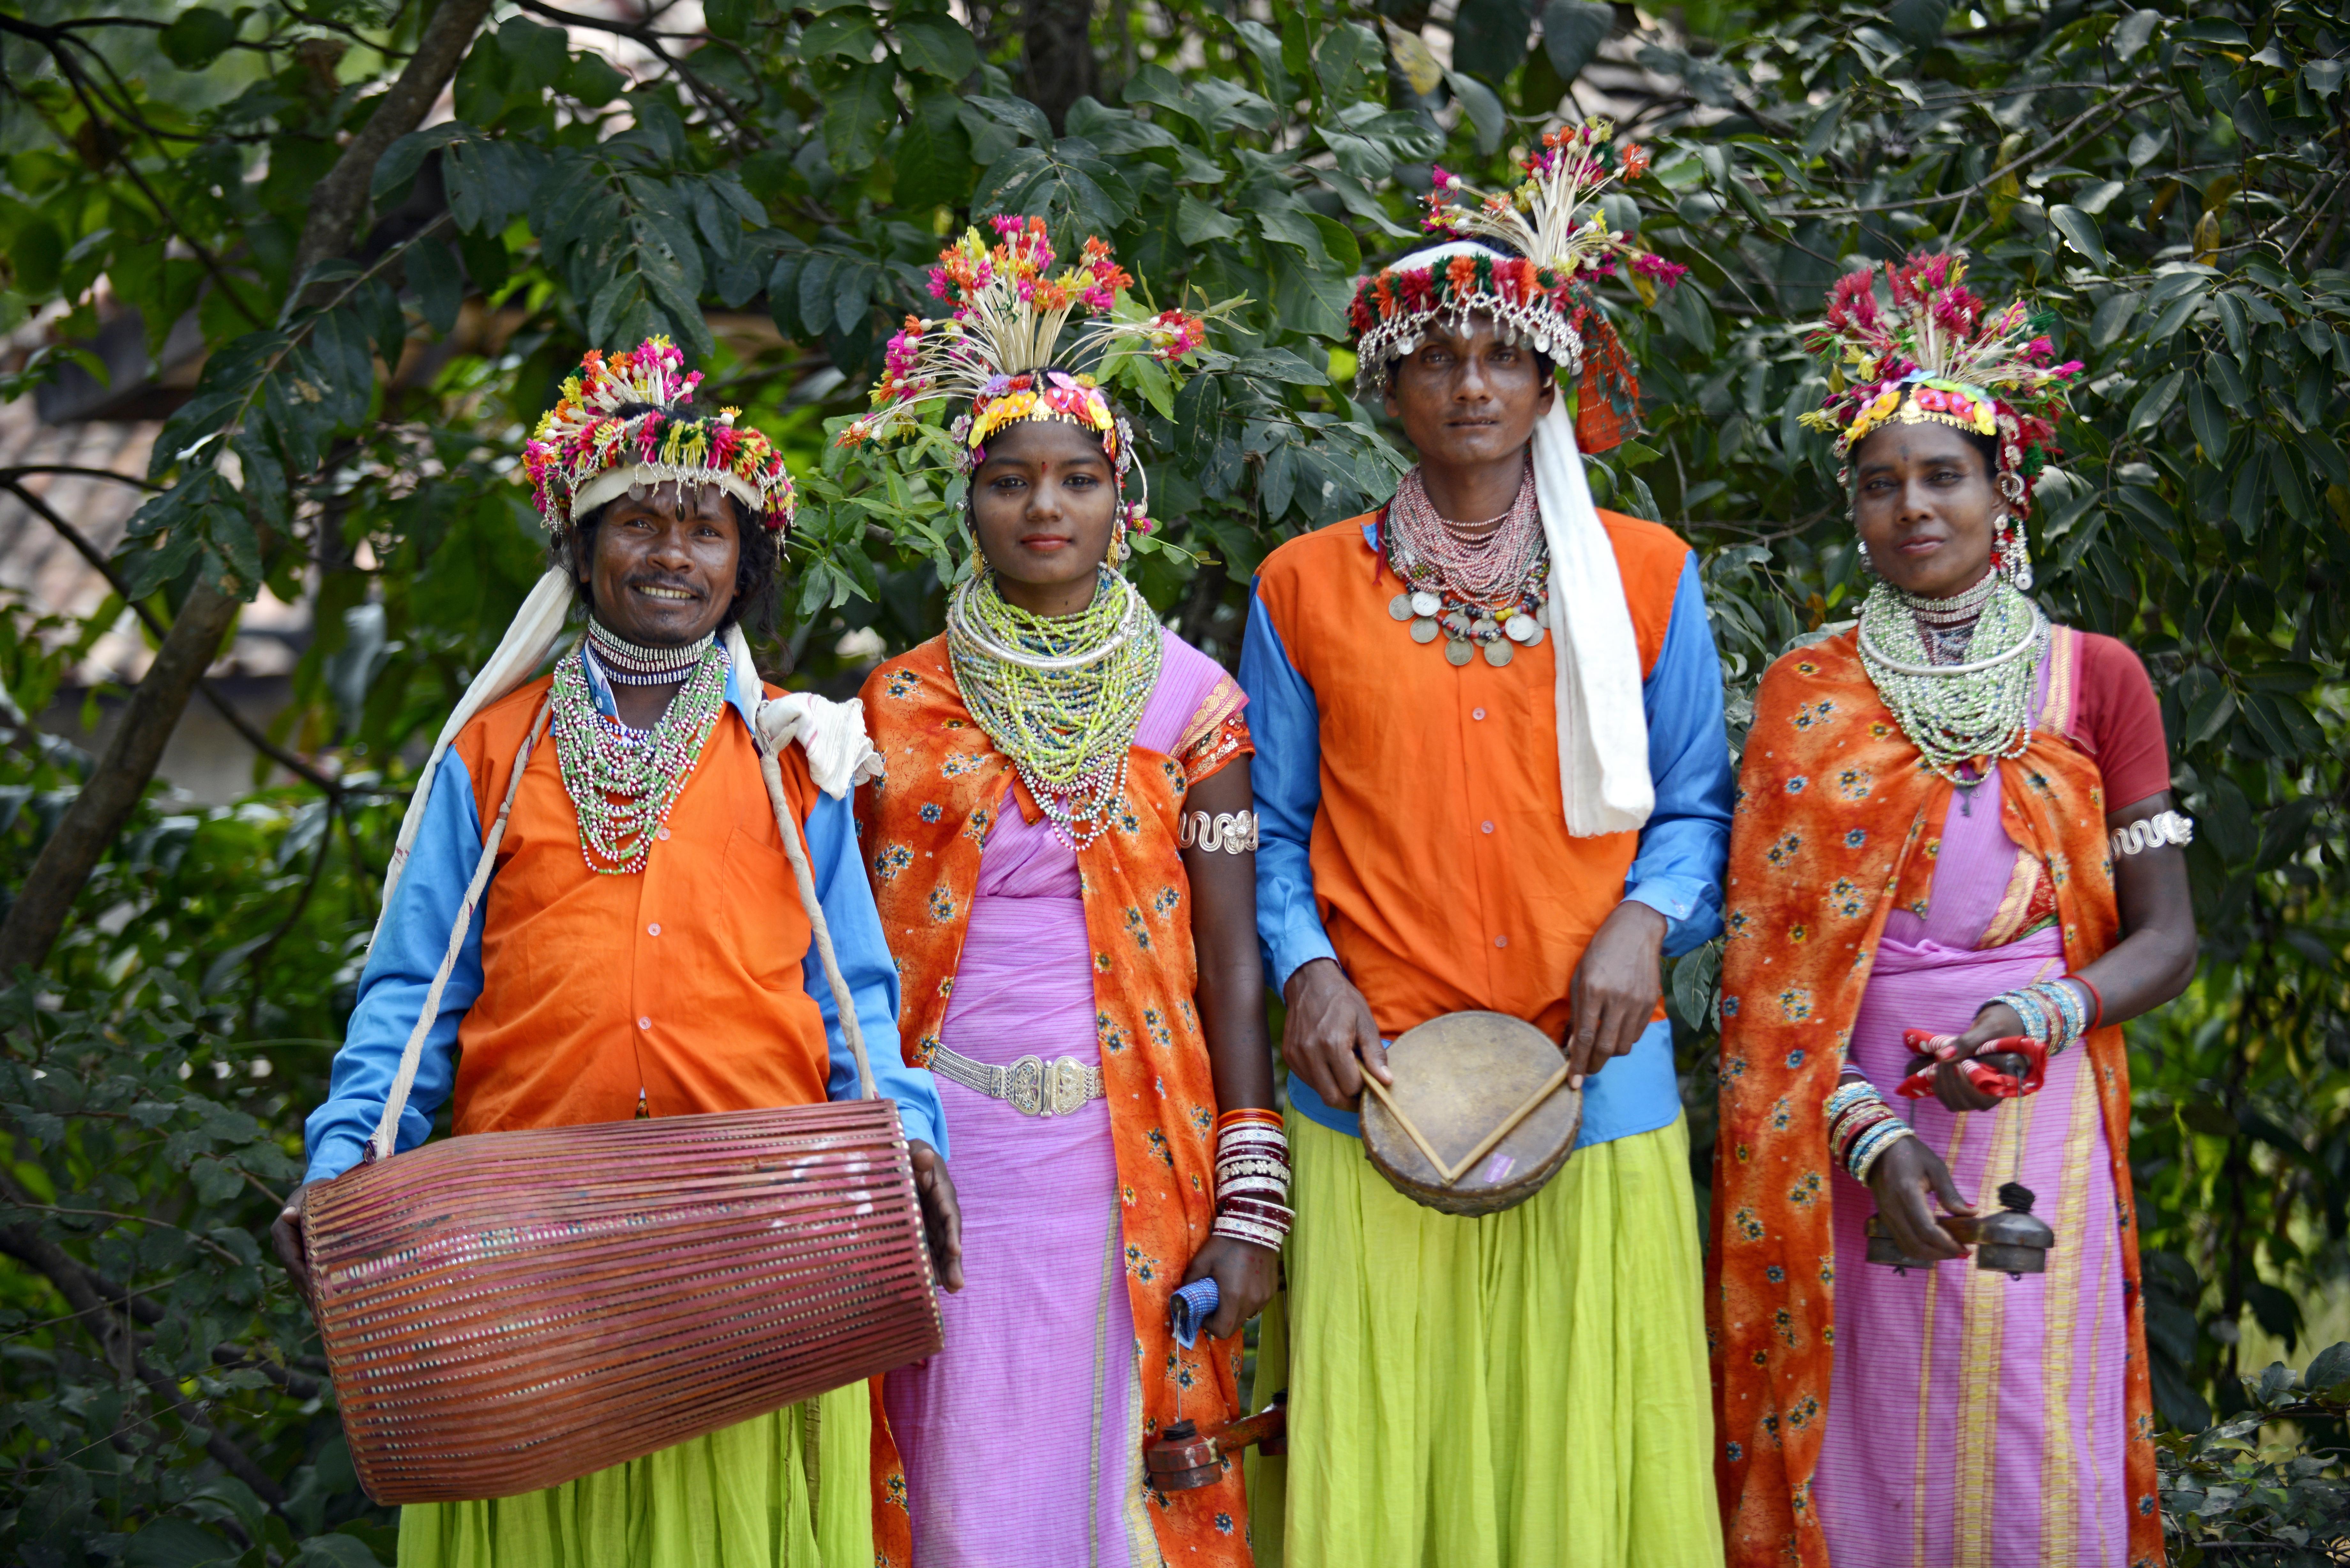 Pugdundee-safaris-TIGER-SAFARI-IN-BANDHAVGARH-Top-5-Things-to-do-in-Bandhavgarh-Beyond-Safari-in-2020